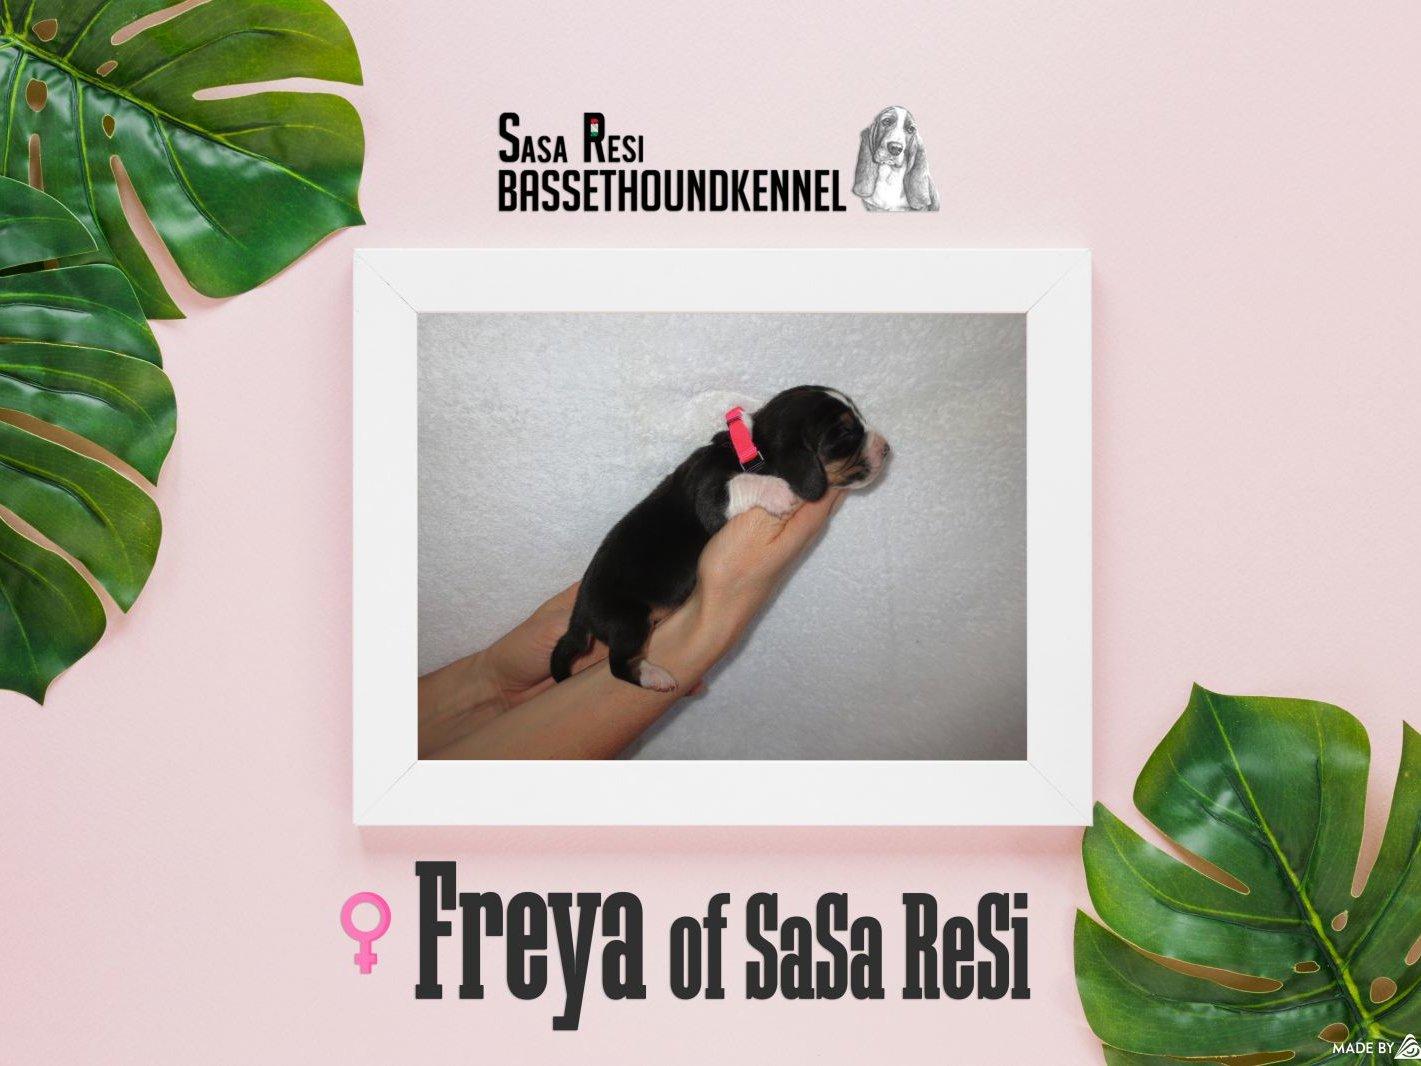 Freya2 uai SaSa ReSi Bassethoundkennel